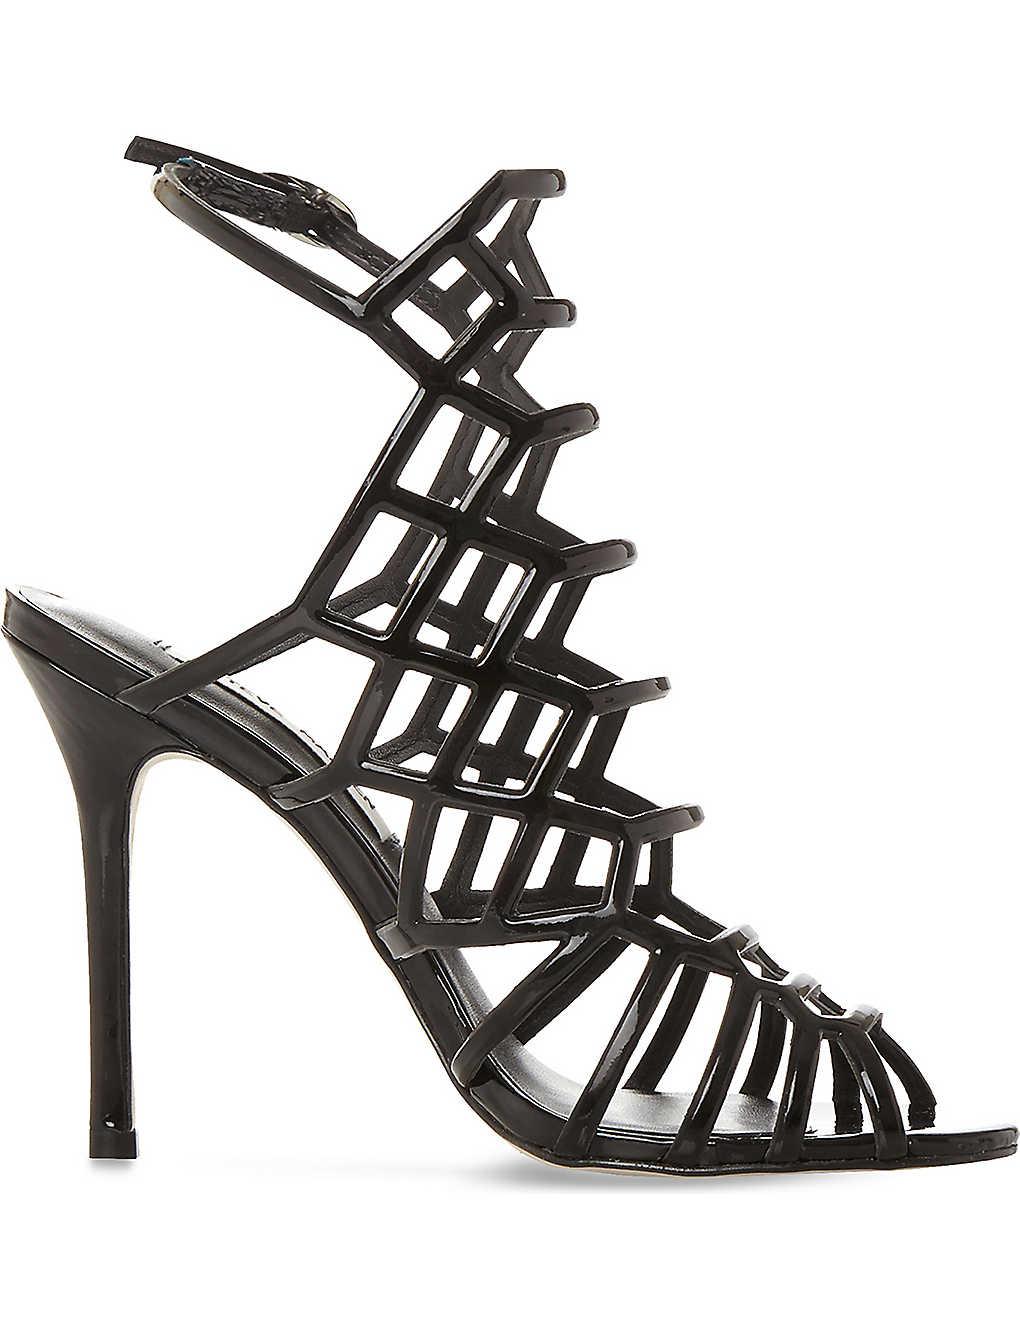 68de0954c8b STEVE MADDEN - Slithur caged patent sandals | Selfridges.com